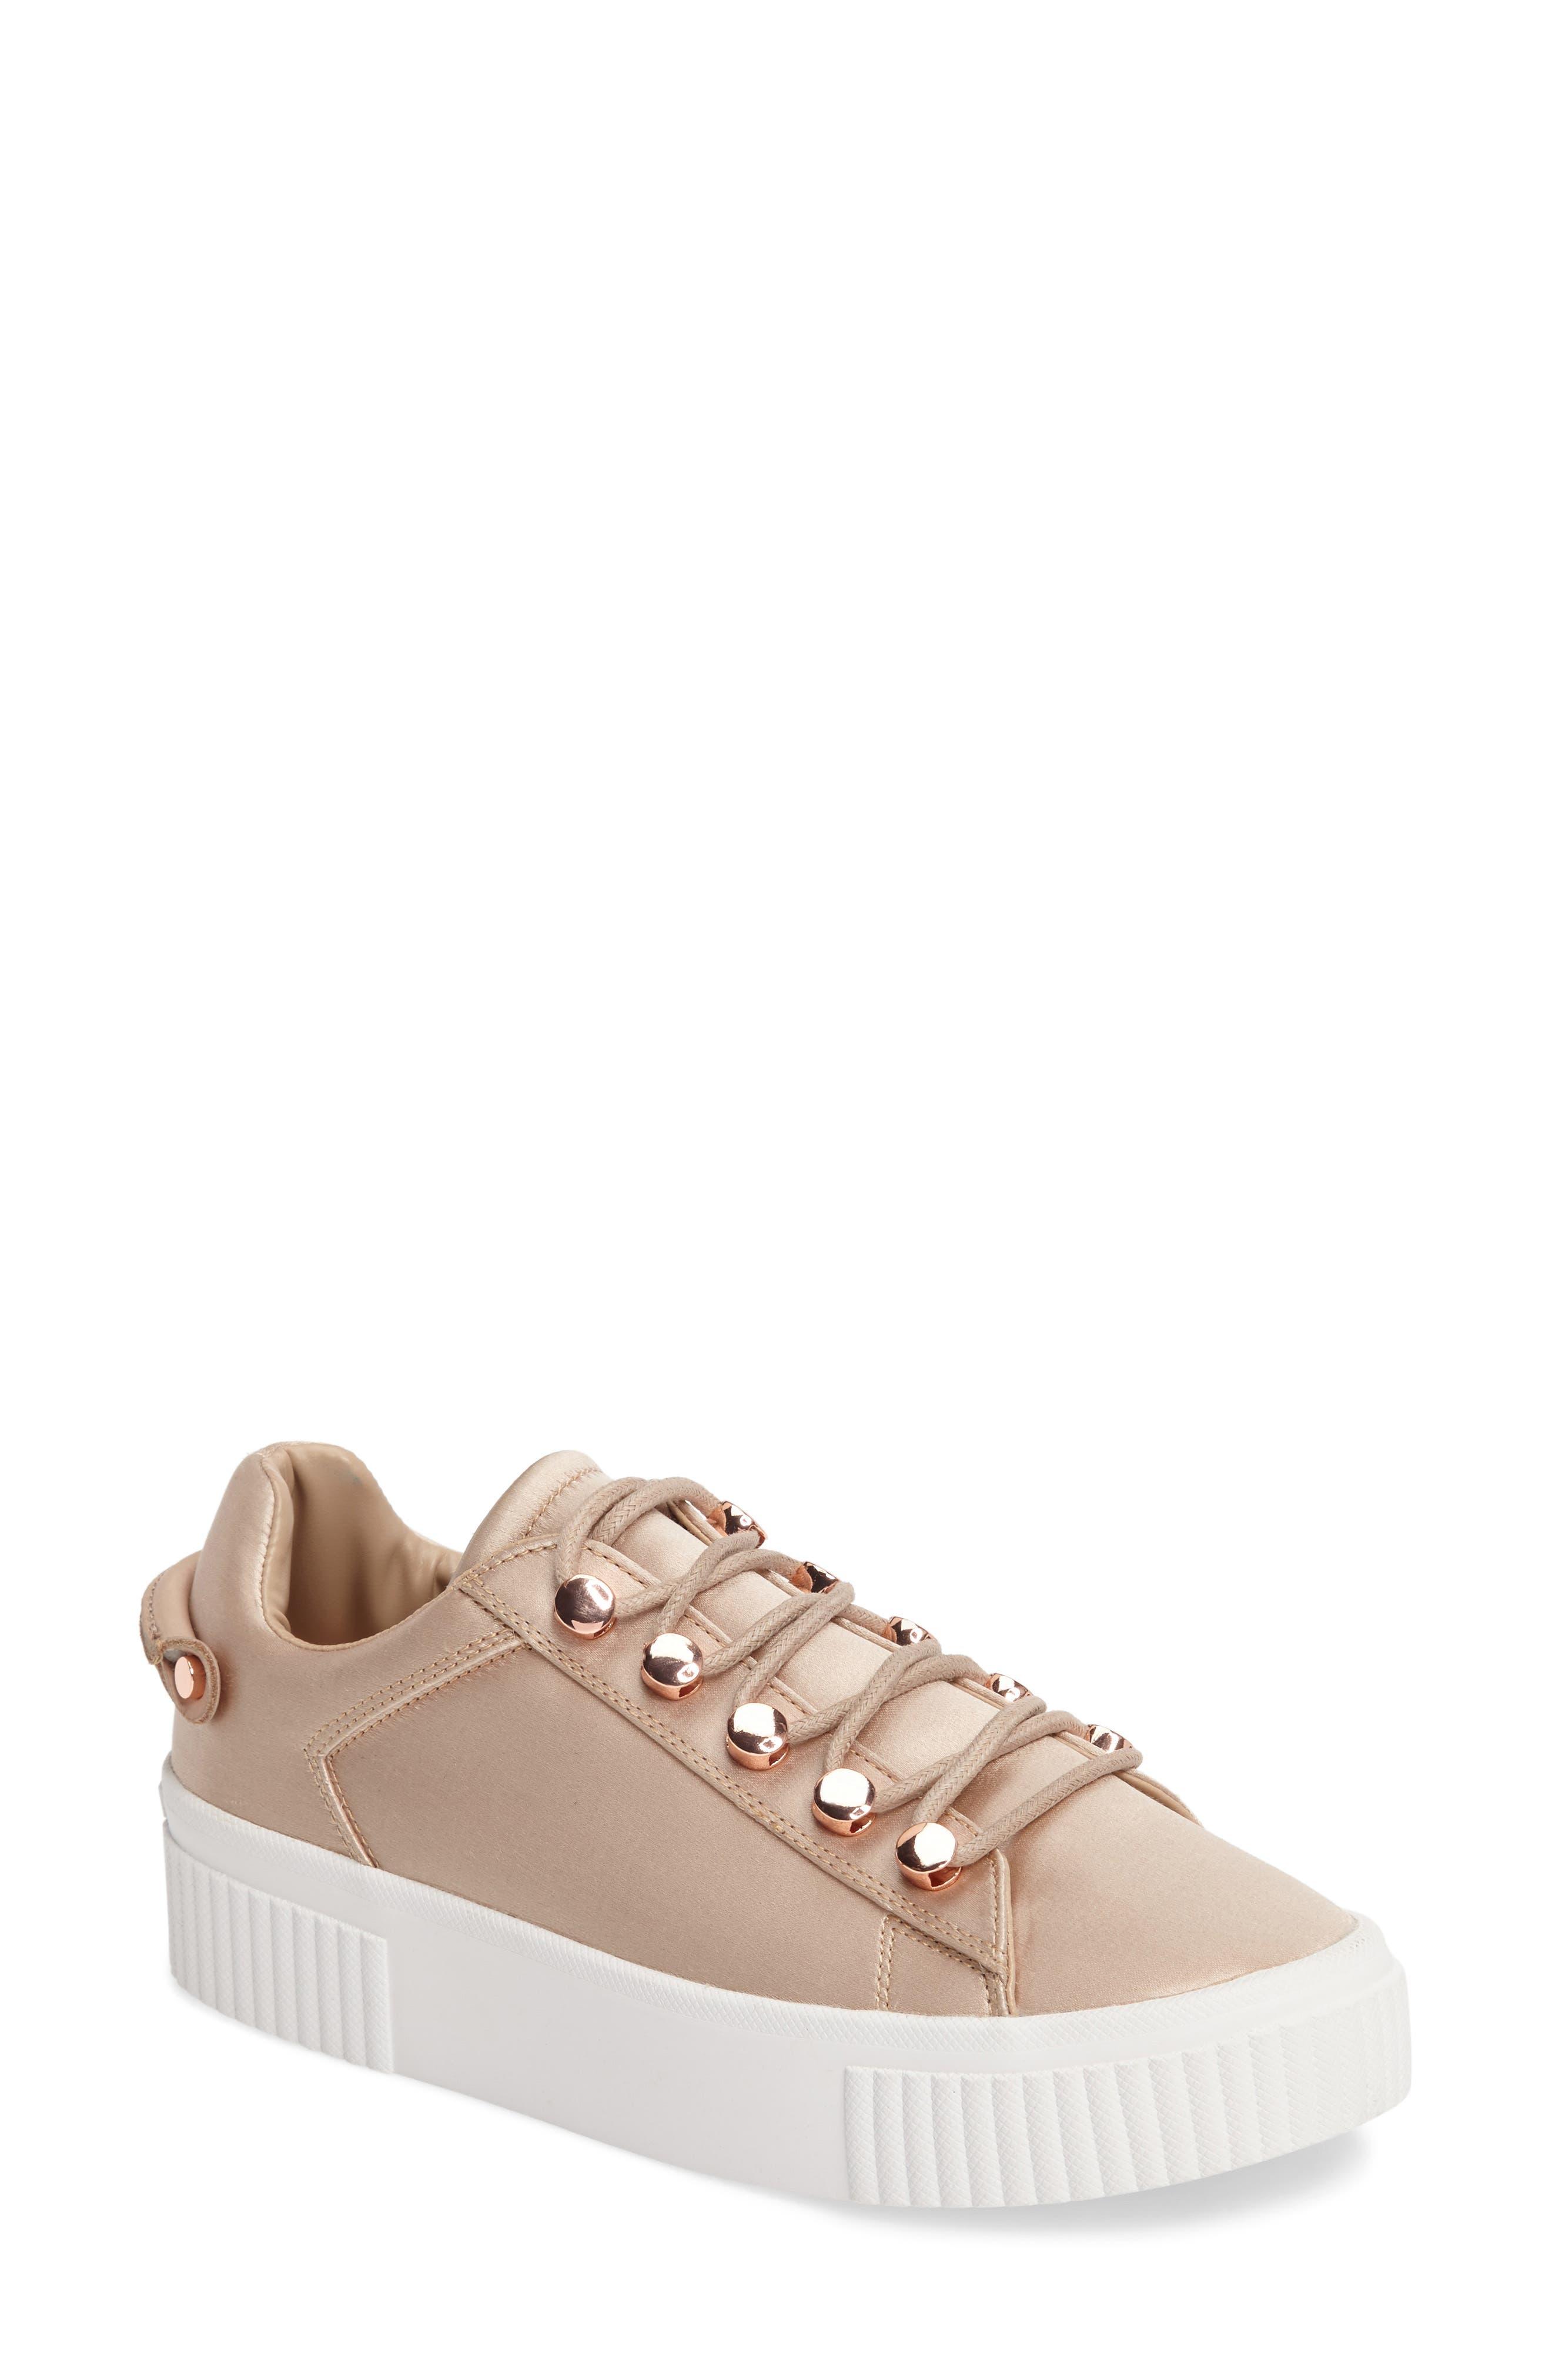 Rae 3 Platform Sneaker,                         Main,                         color, Blush Satin